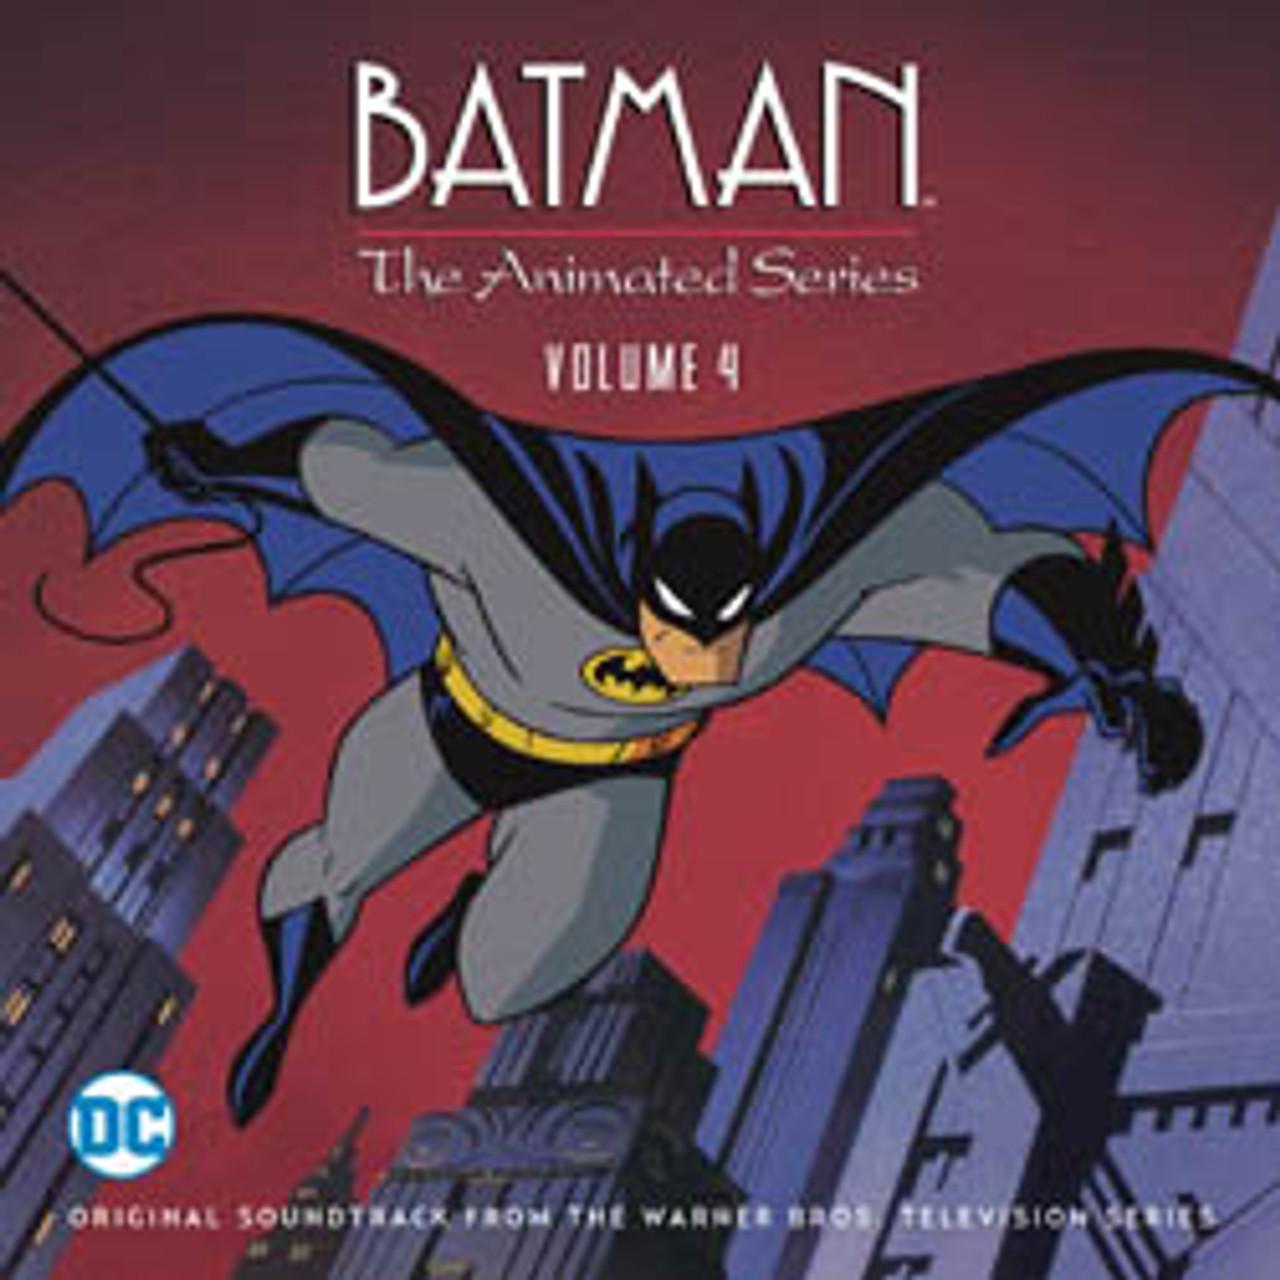 Batman The Animated Series Vol 4 Limited Edition 2 Cd Set La La Land Records